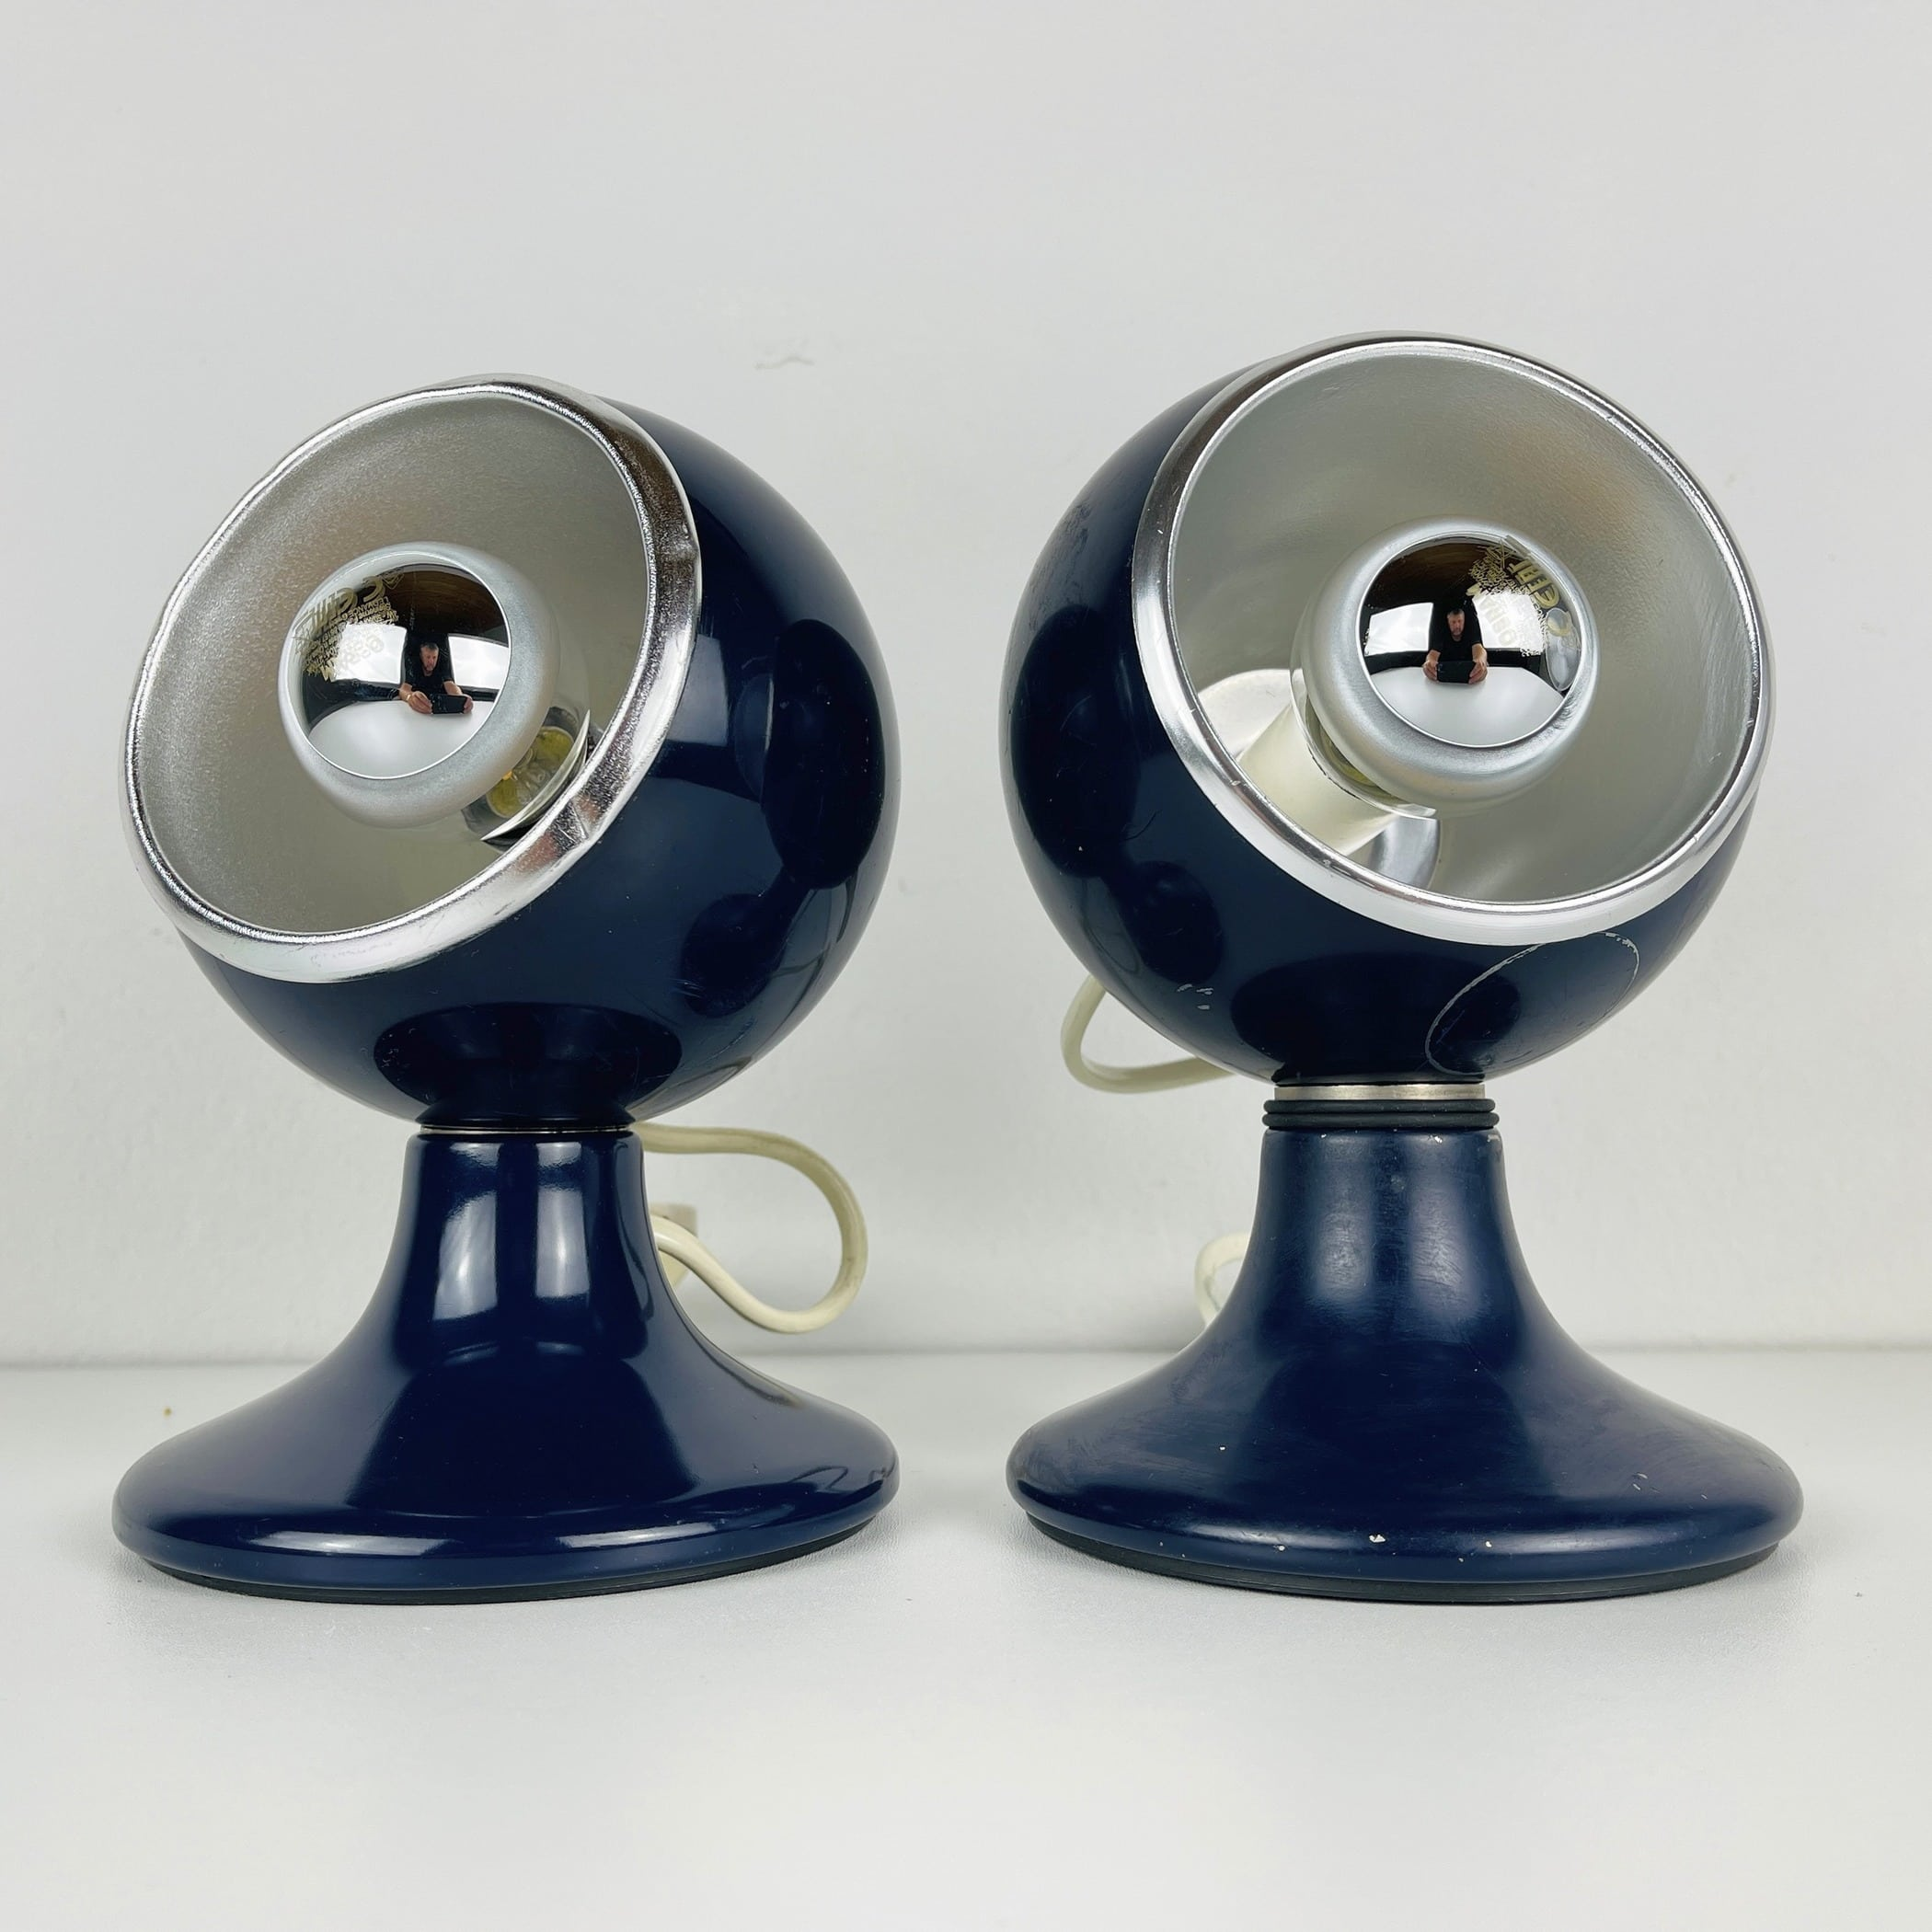 Pair of mid-century blue eyeball table or wall lamps by Luci Illuminazione di Interni Milano Italy 1970s Model C-414